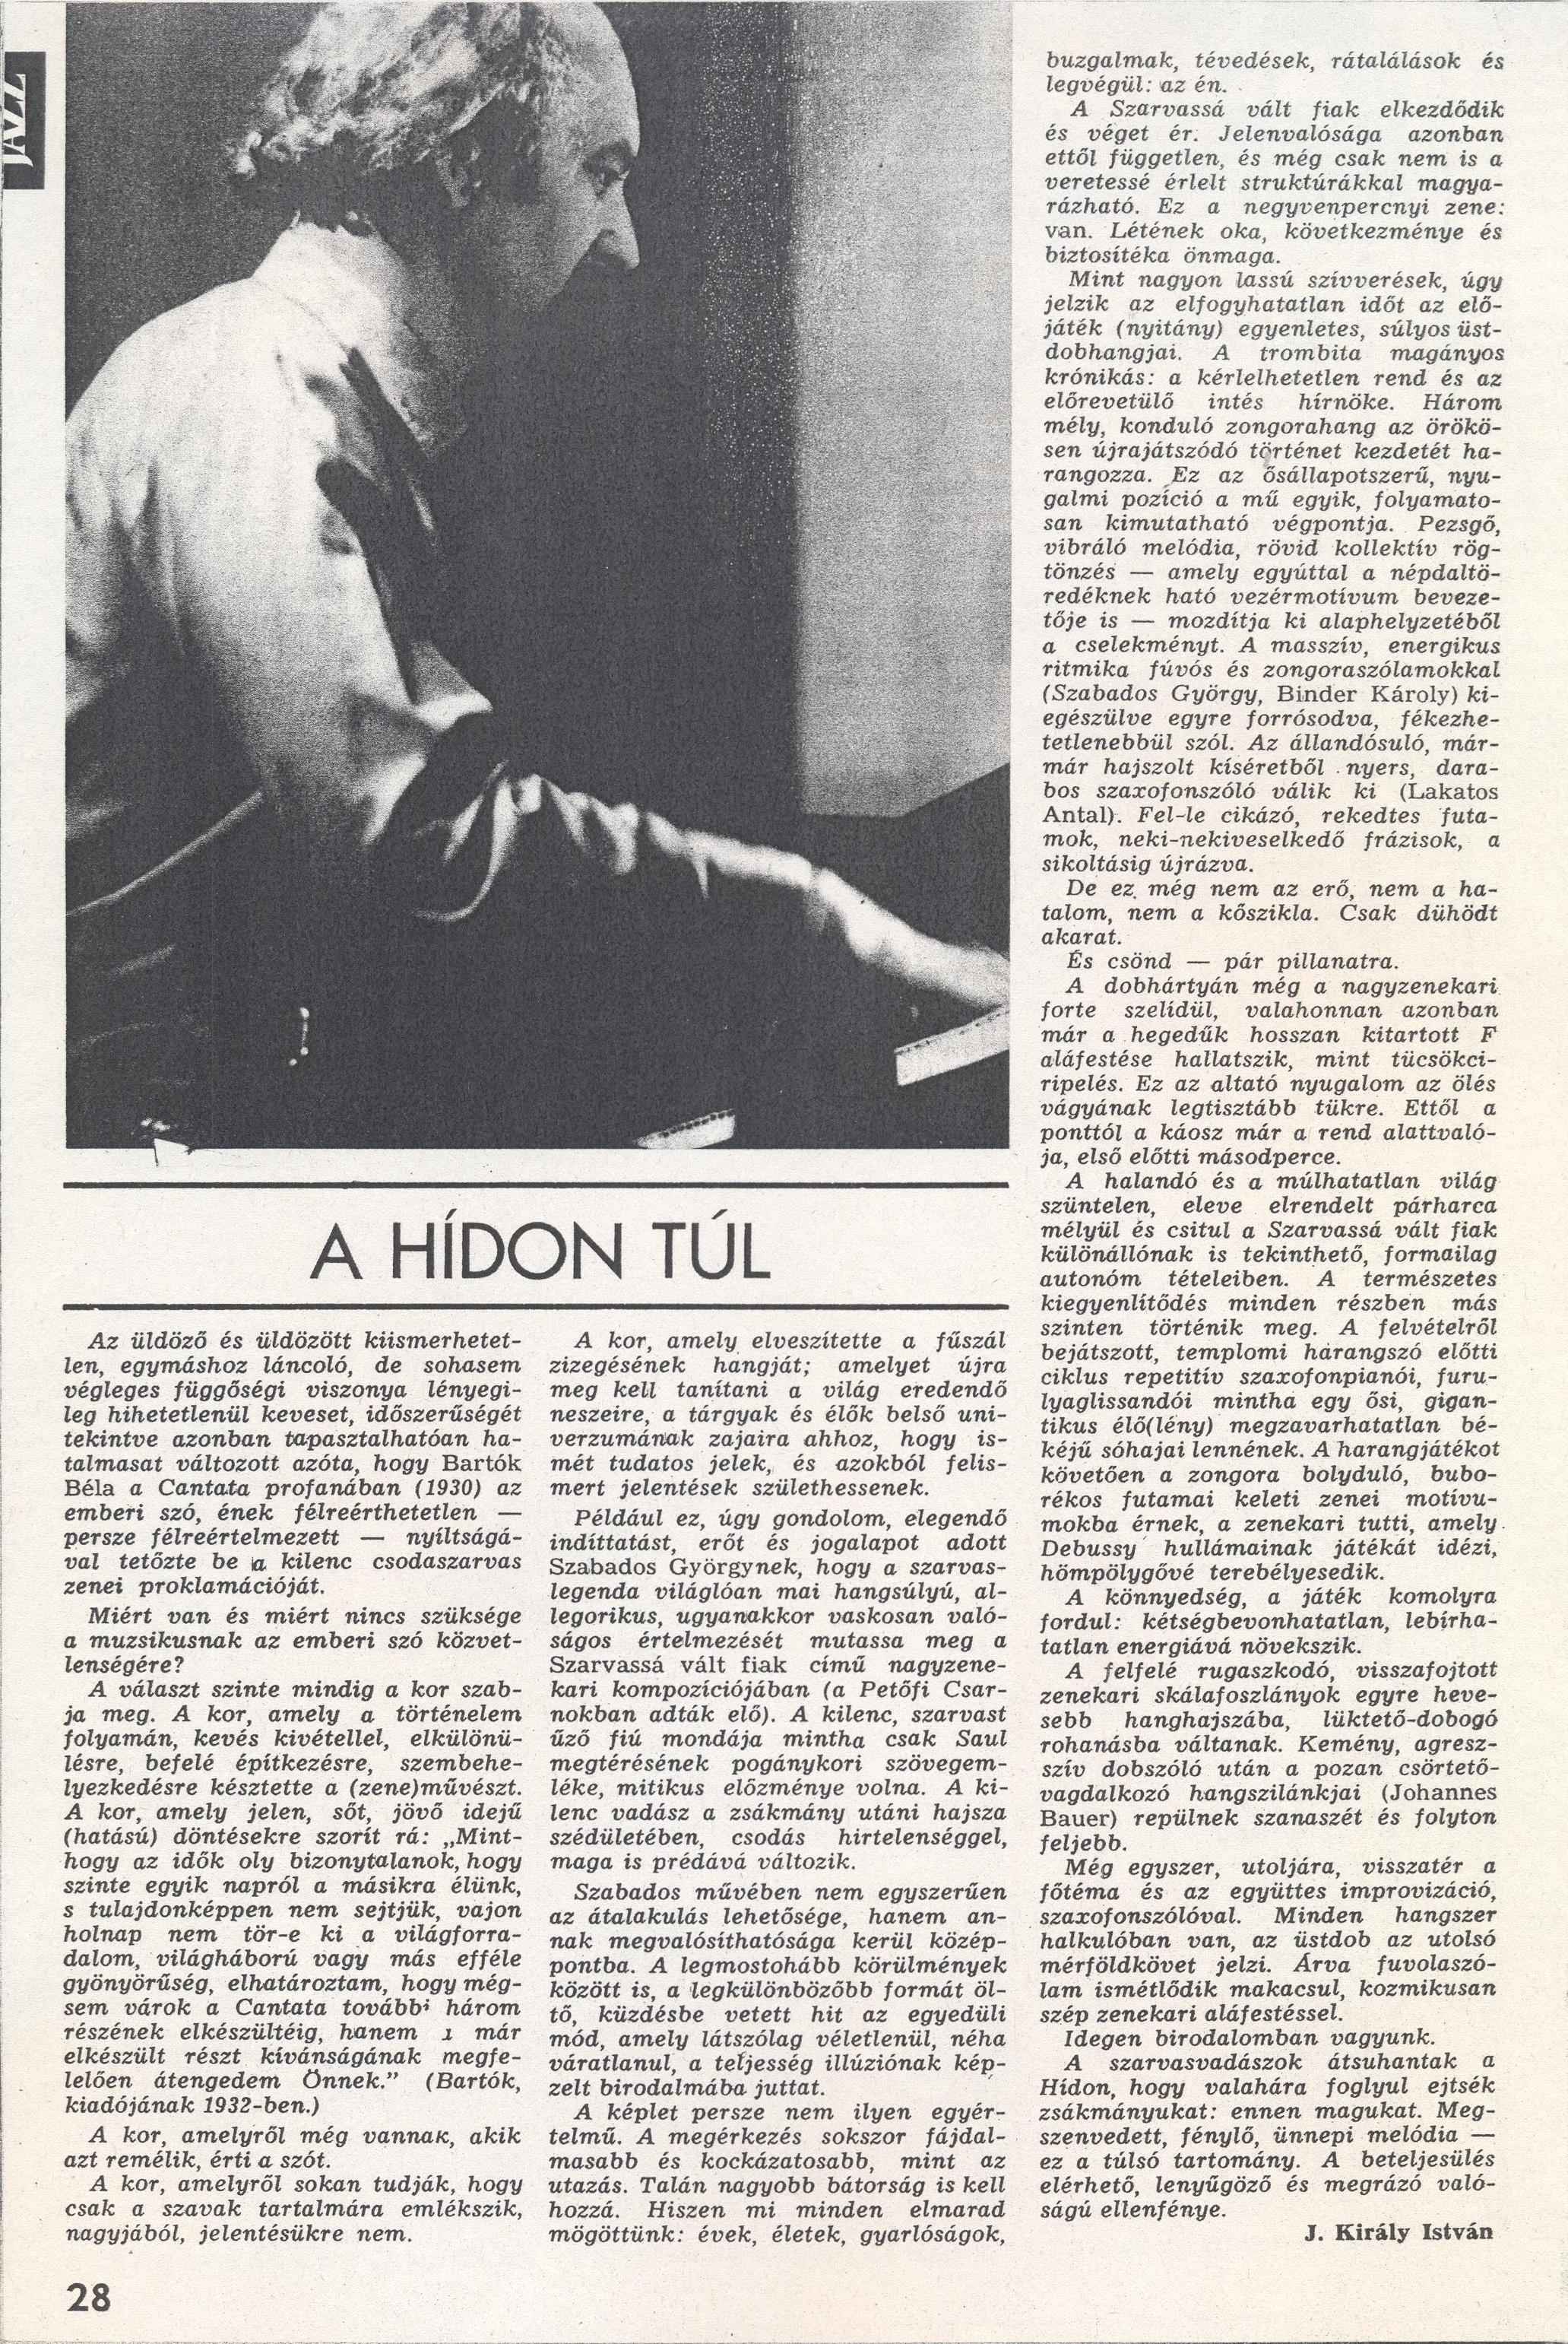 Hidontul_fszm_1988-20